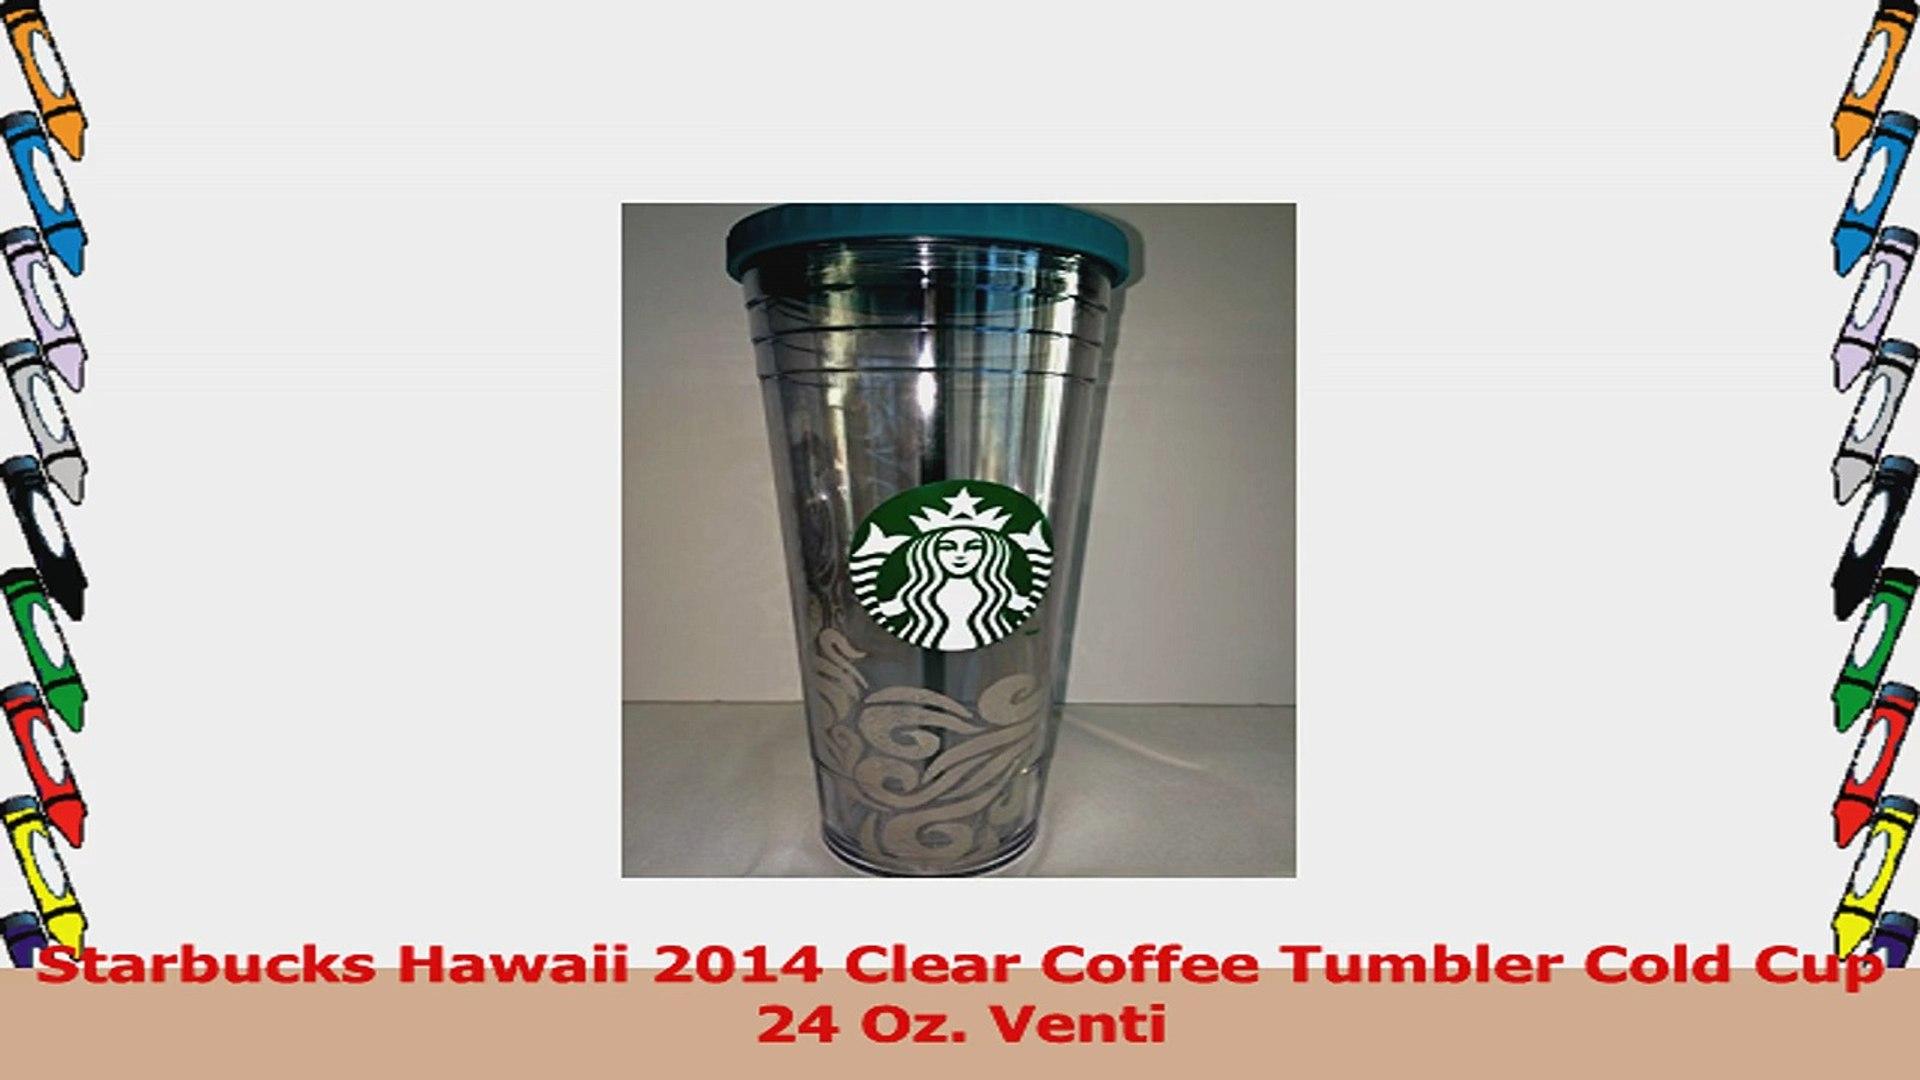 423d926c17f Starbucks Hawaii 2014 Clear Coffee Tumbler Cold Cup 24 Oz Venti abc55966 - video  dailymotion